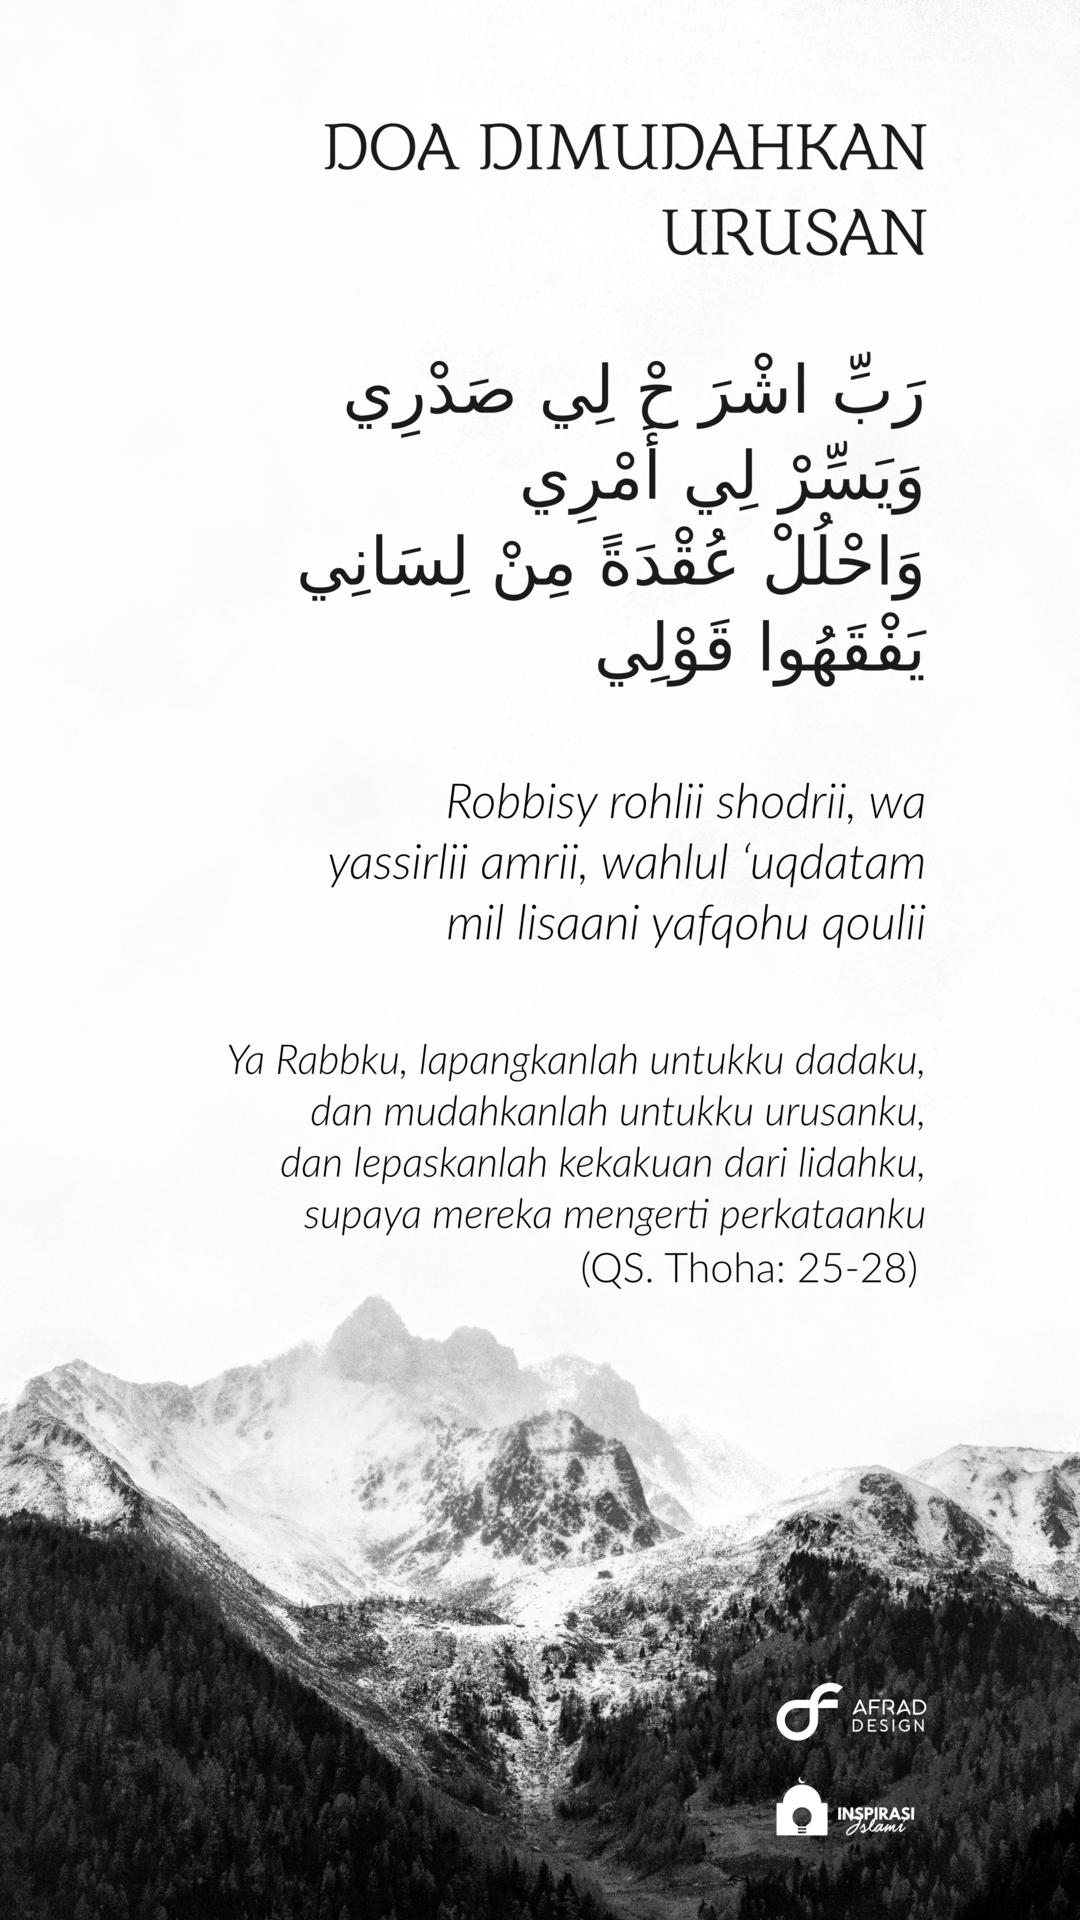 Inspirasi-Islami: Photo